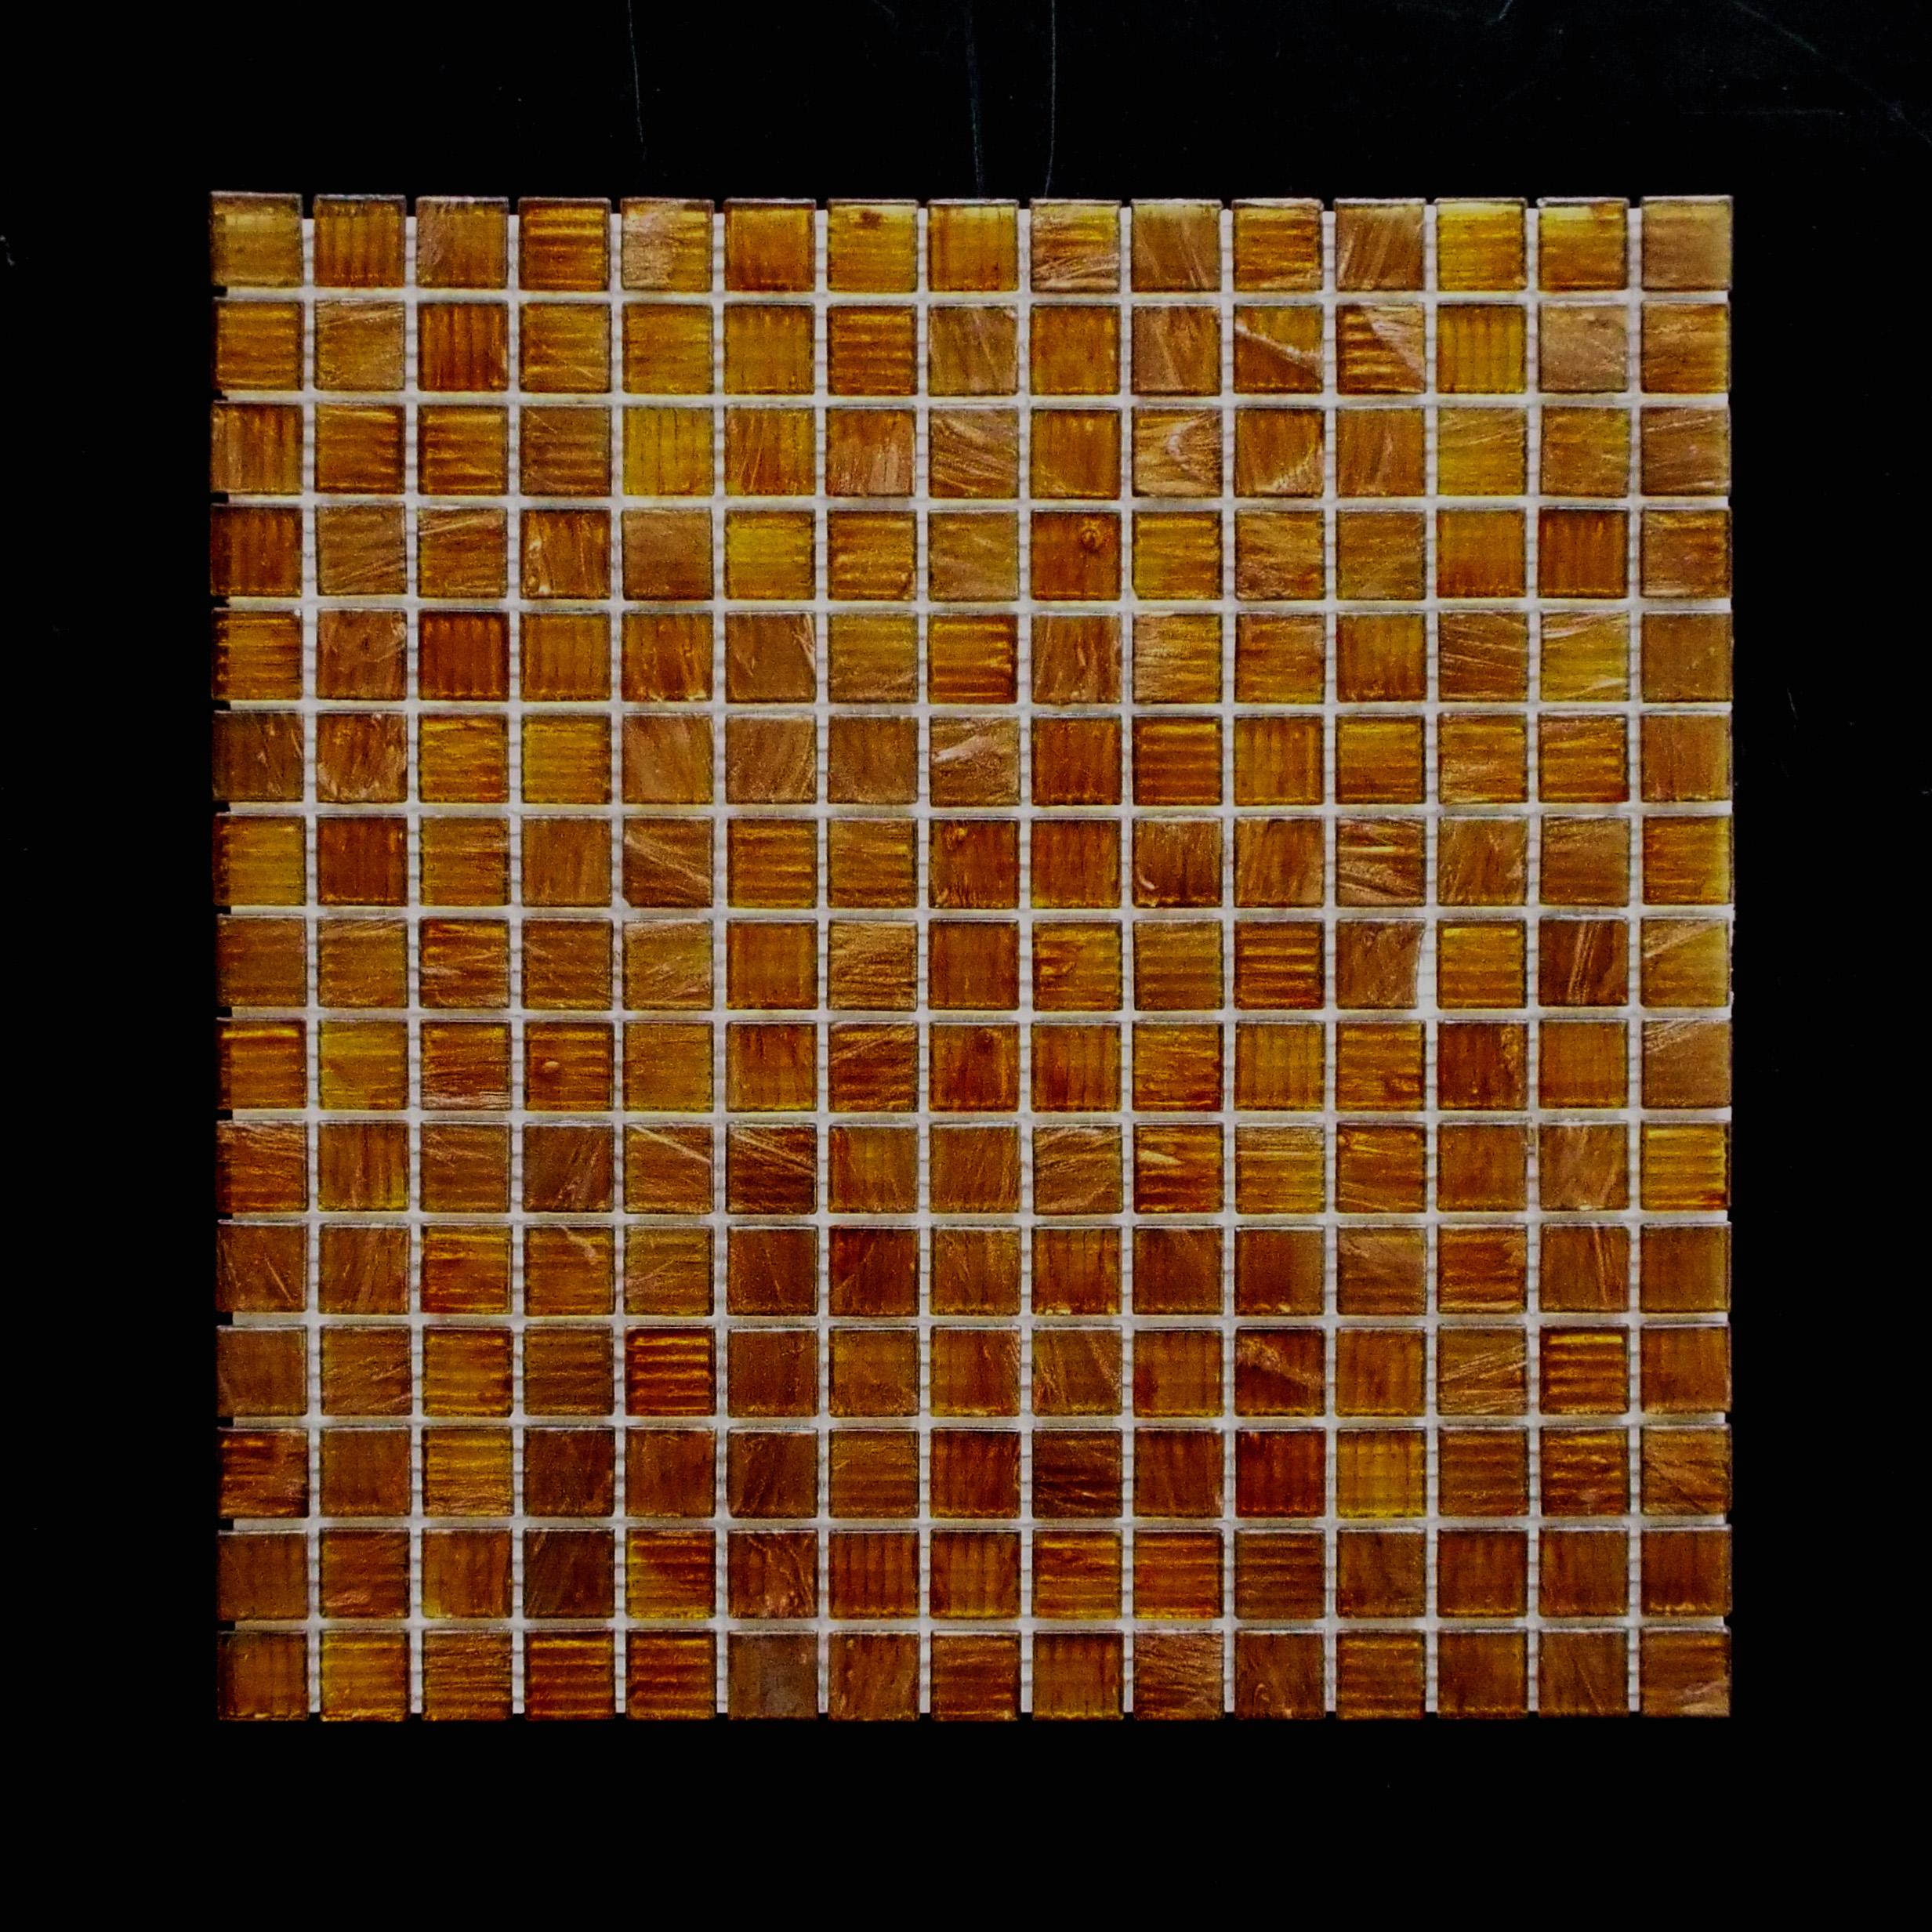 "GOLD DUST - BRONZE     3/4""X3/4""X1/16""   20 PC/CTN (23.03 SF);  72 CTN/PLT"